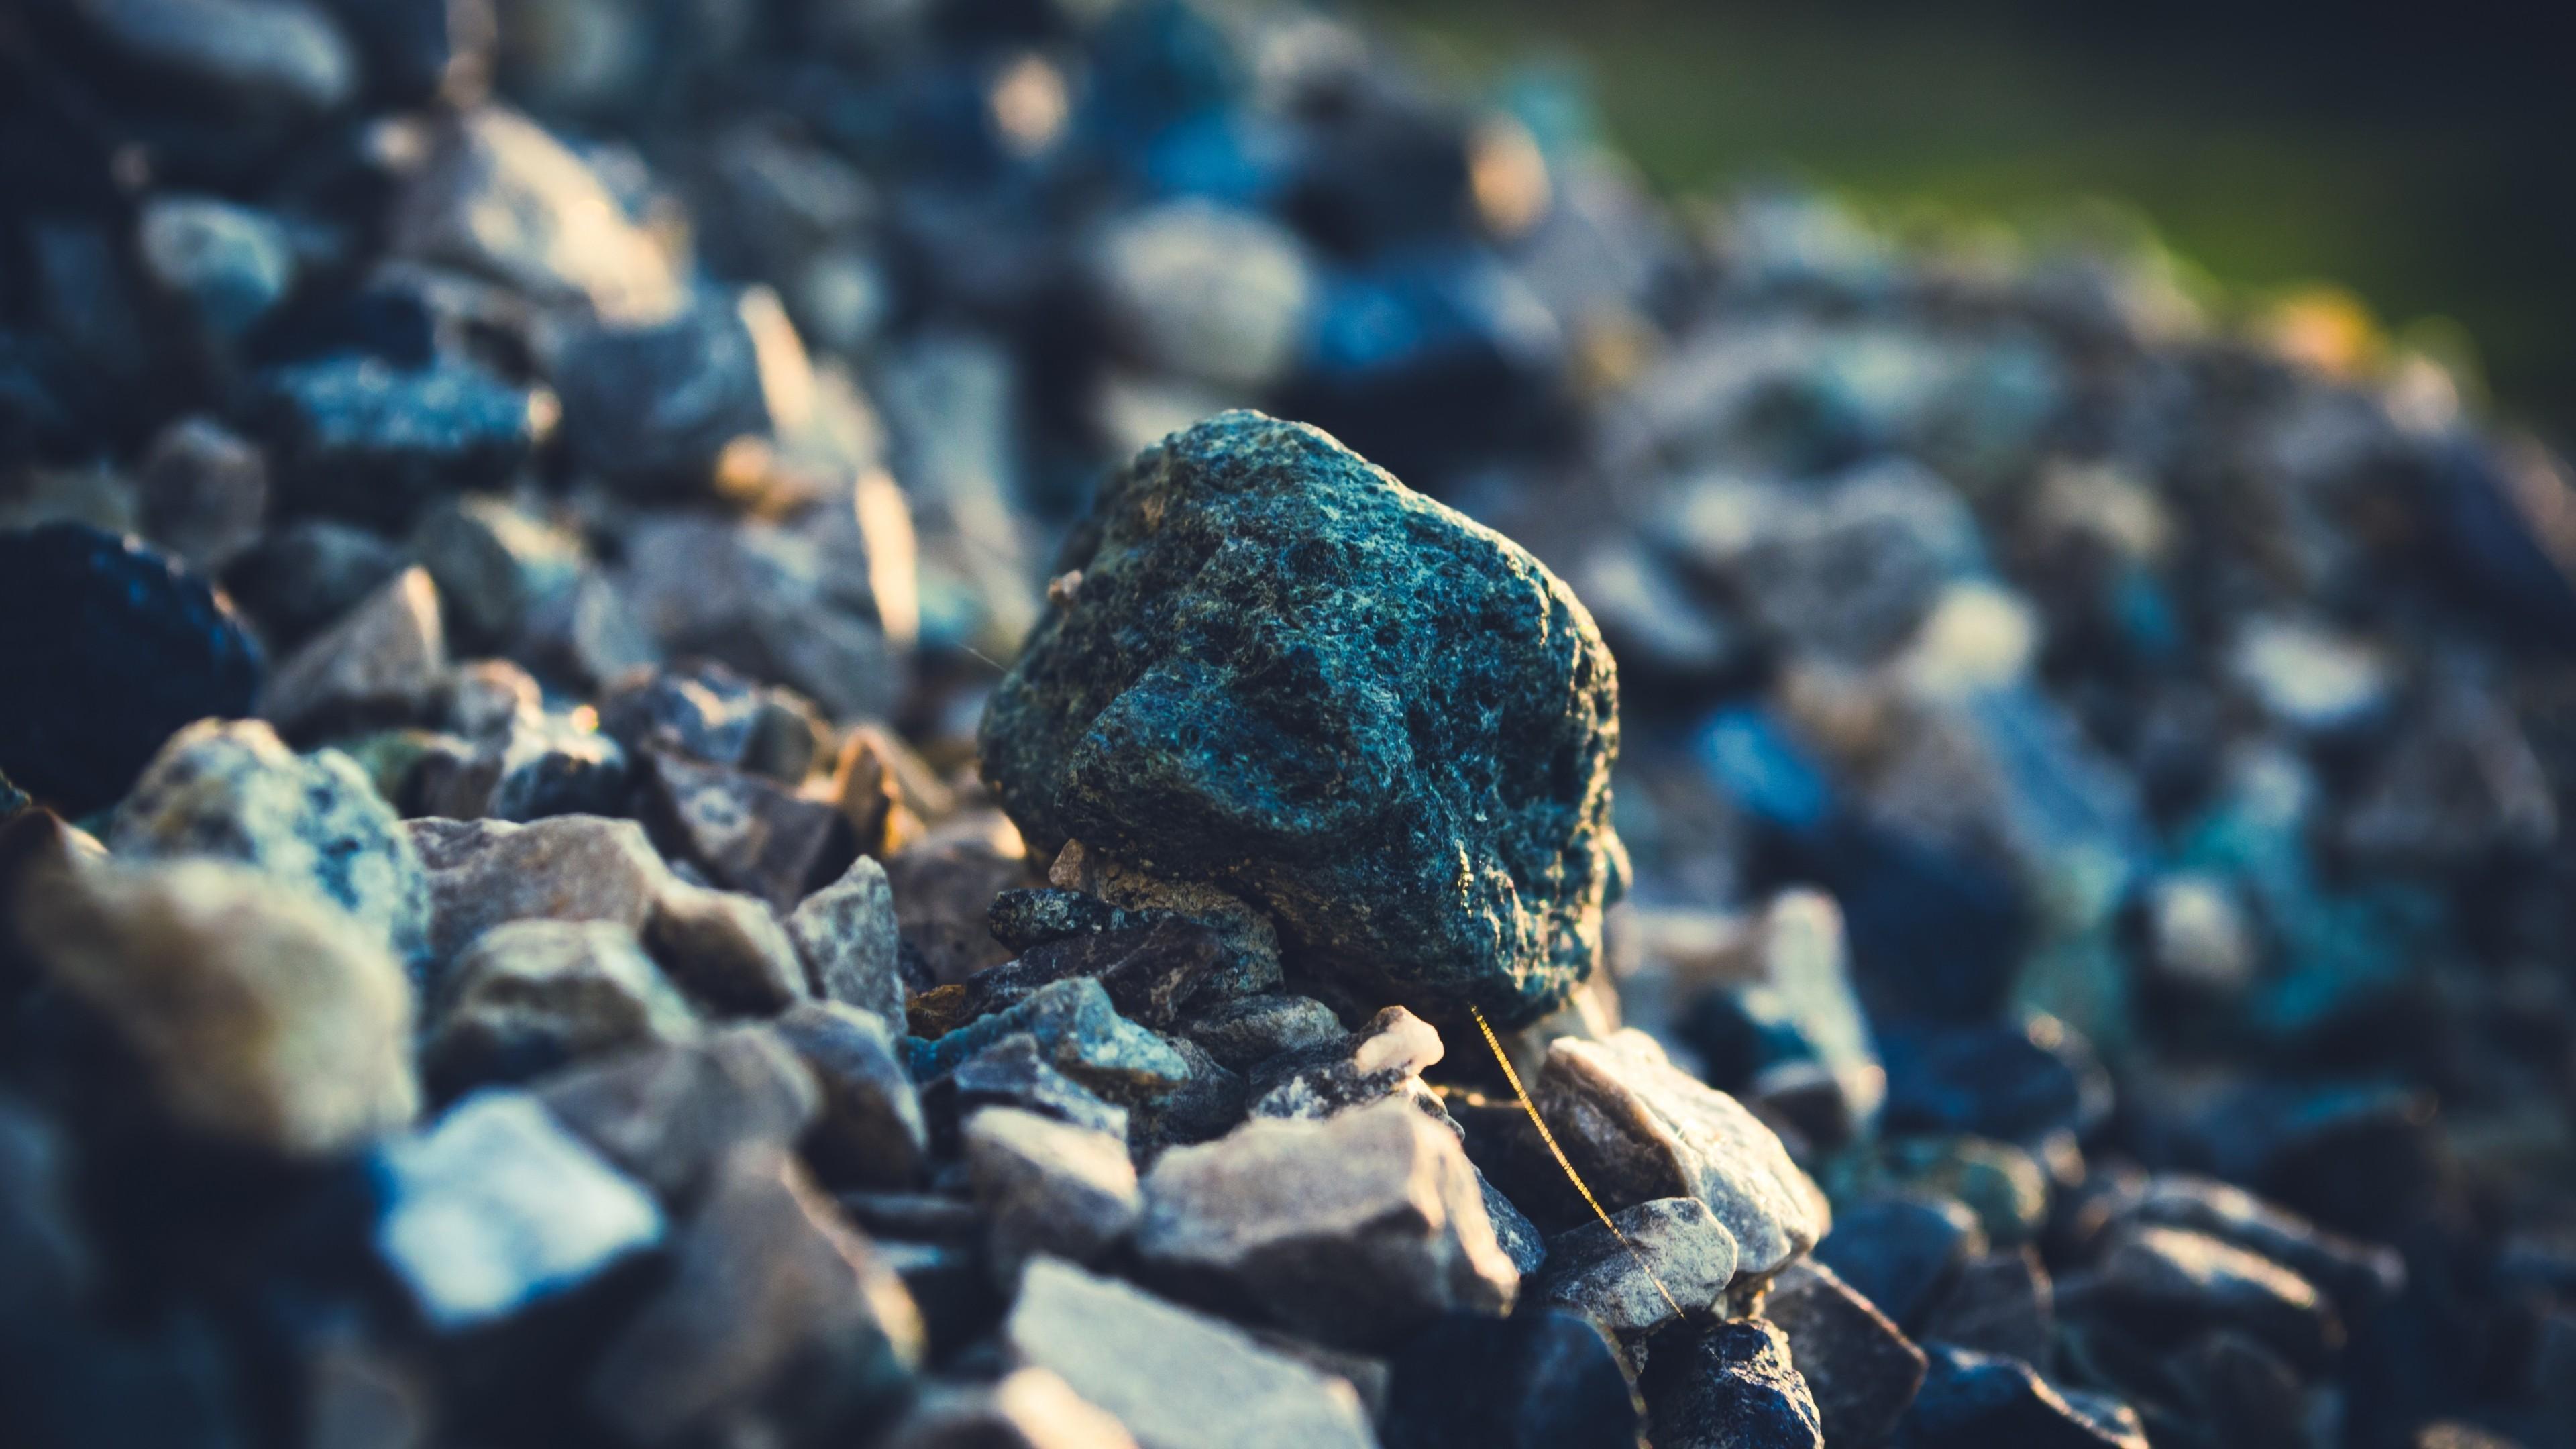 … Background 4K Ultra HD. Wallpaper stone, gravel, close-up